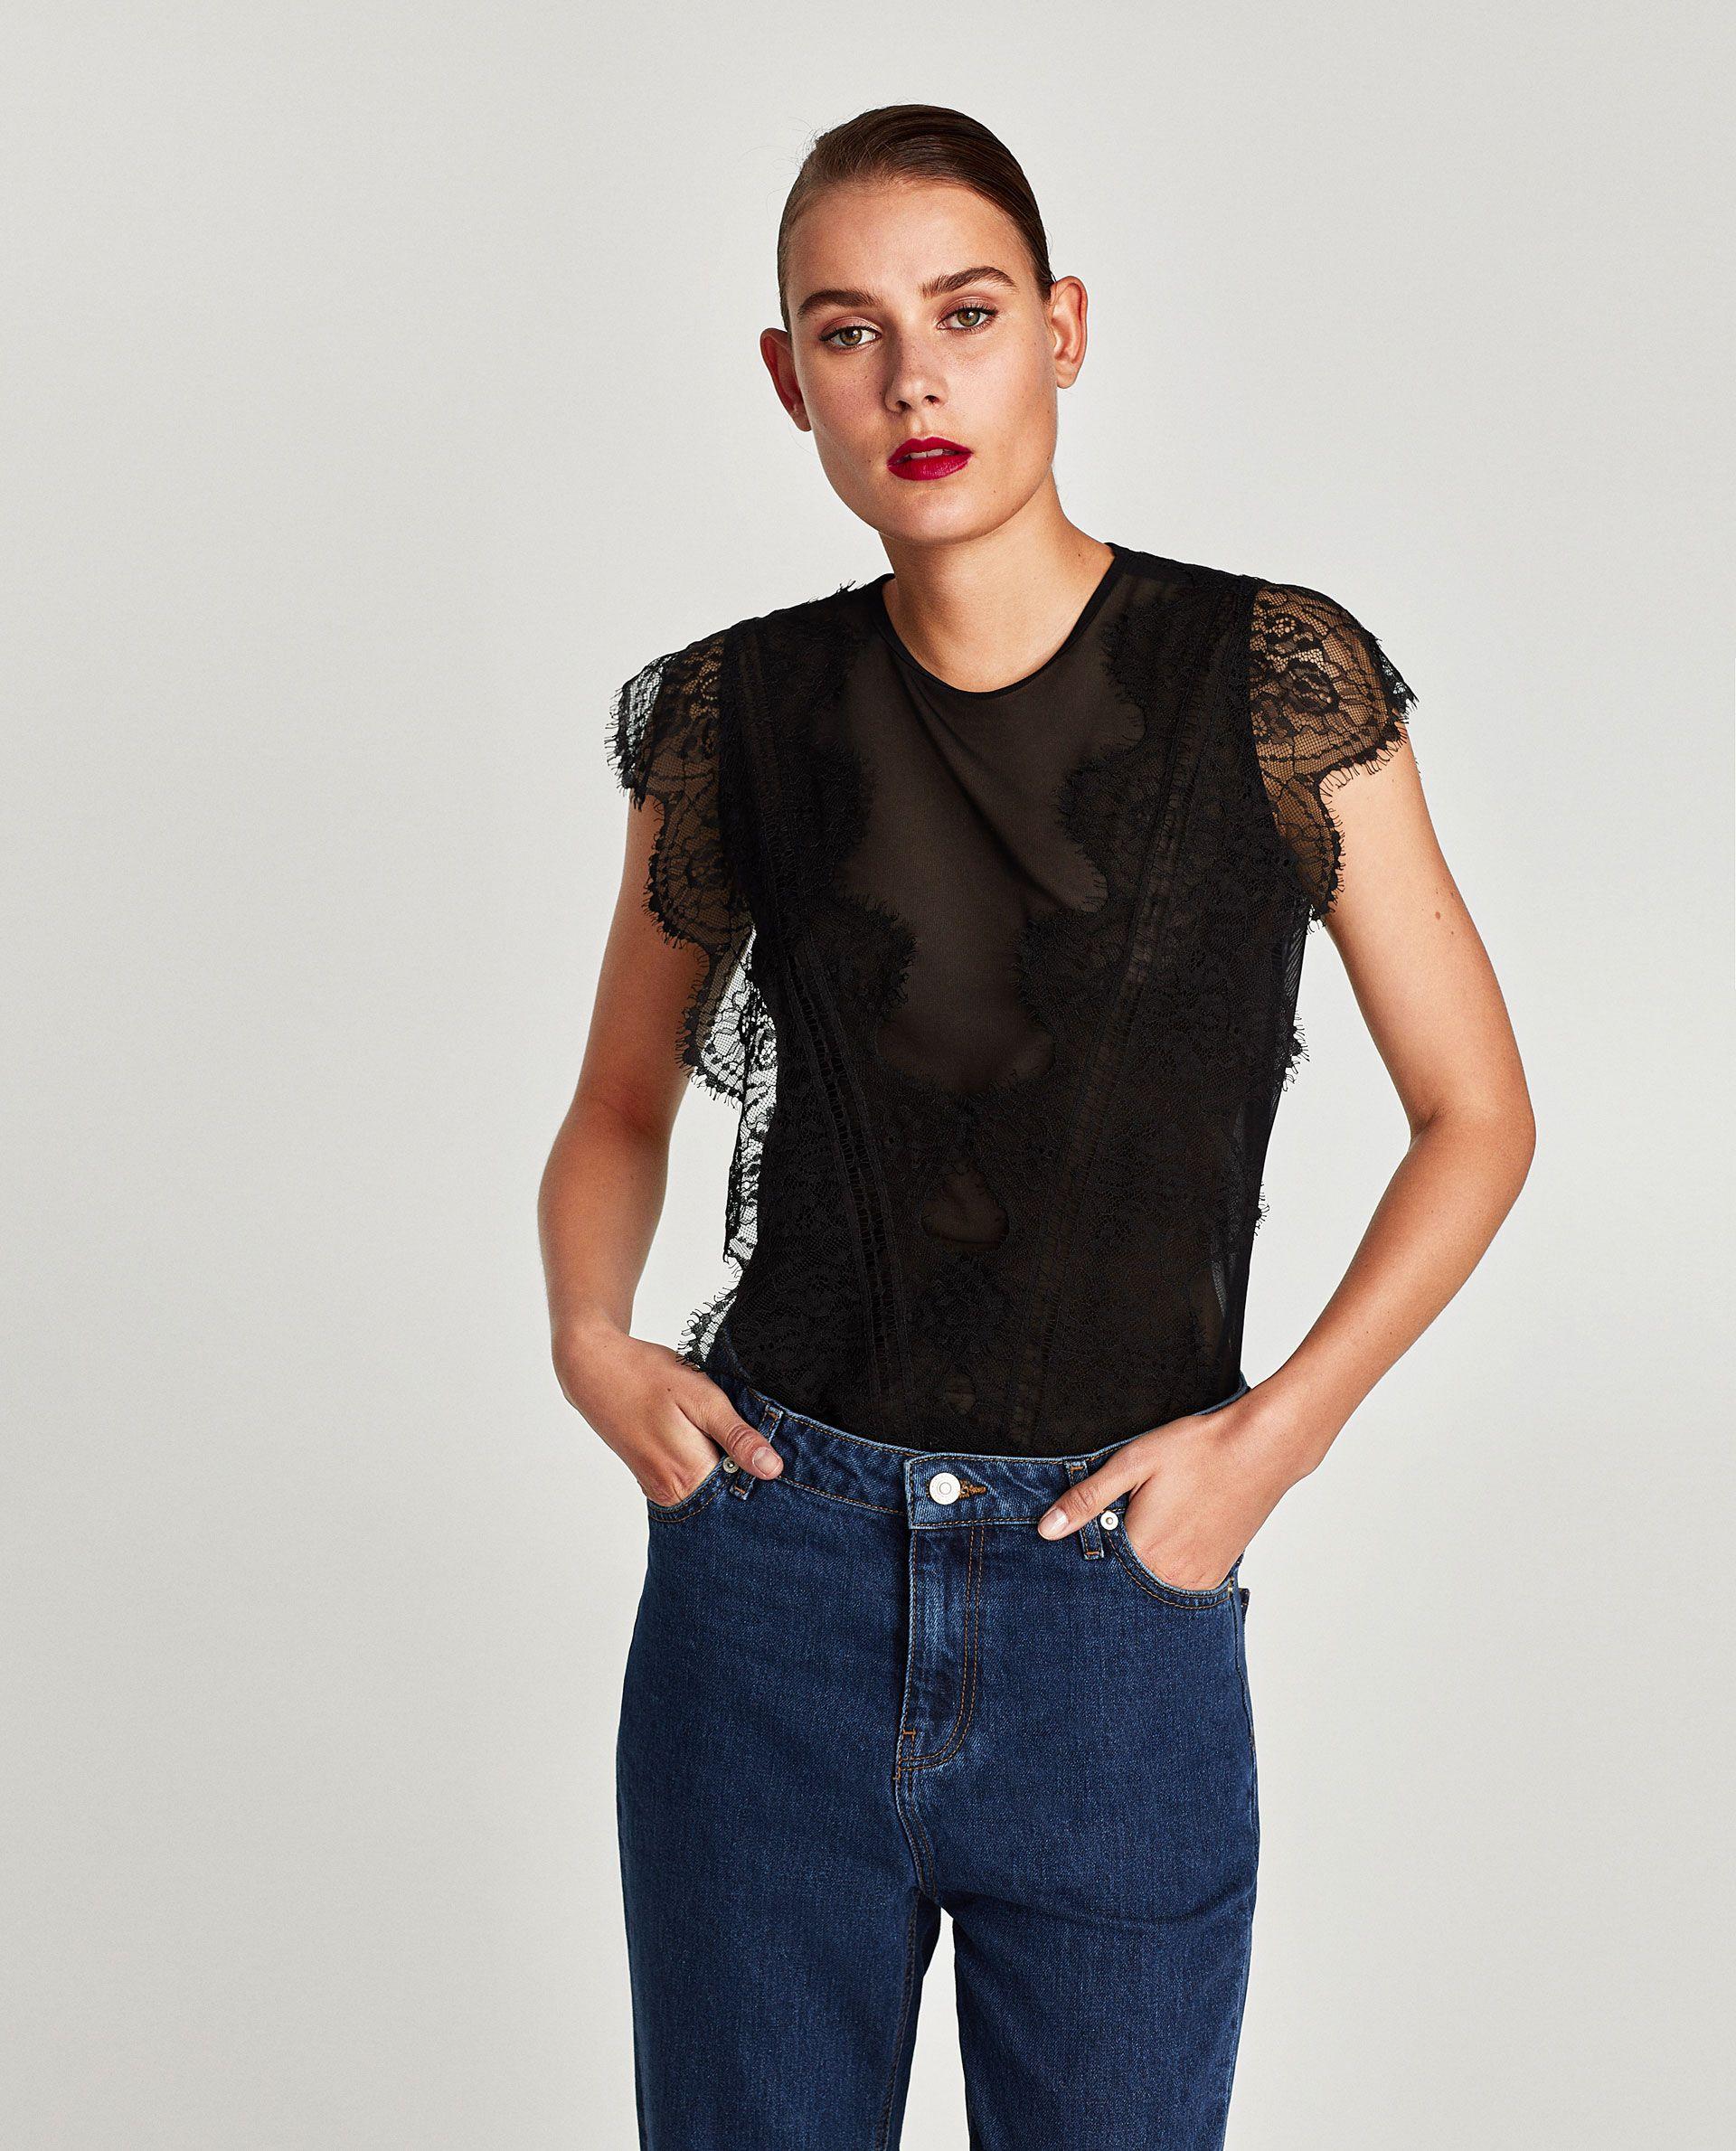 Lace bodysuit with jeans  TULLE AND LACE BODYSUIT  costume  Pinterest  Bodysuit